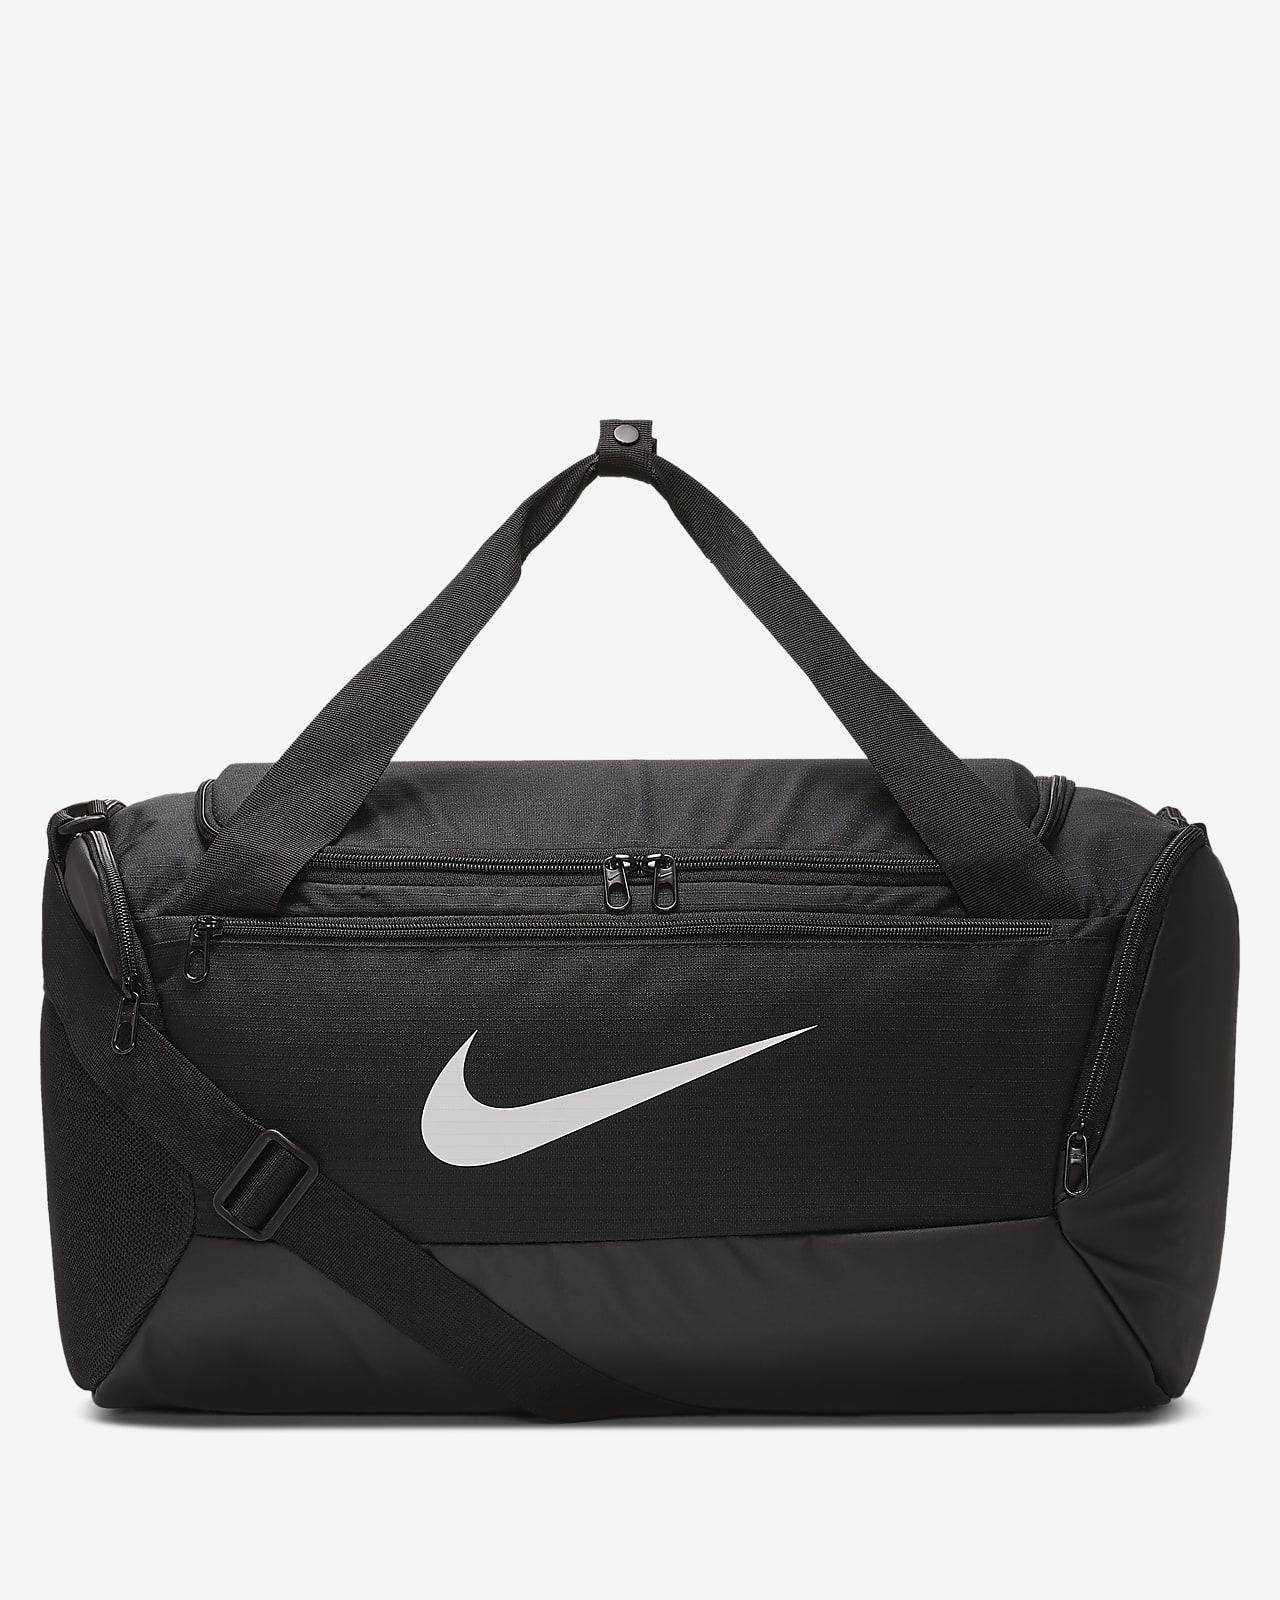 Nike Brasilia edzőtáska (kisméretű)